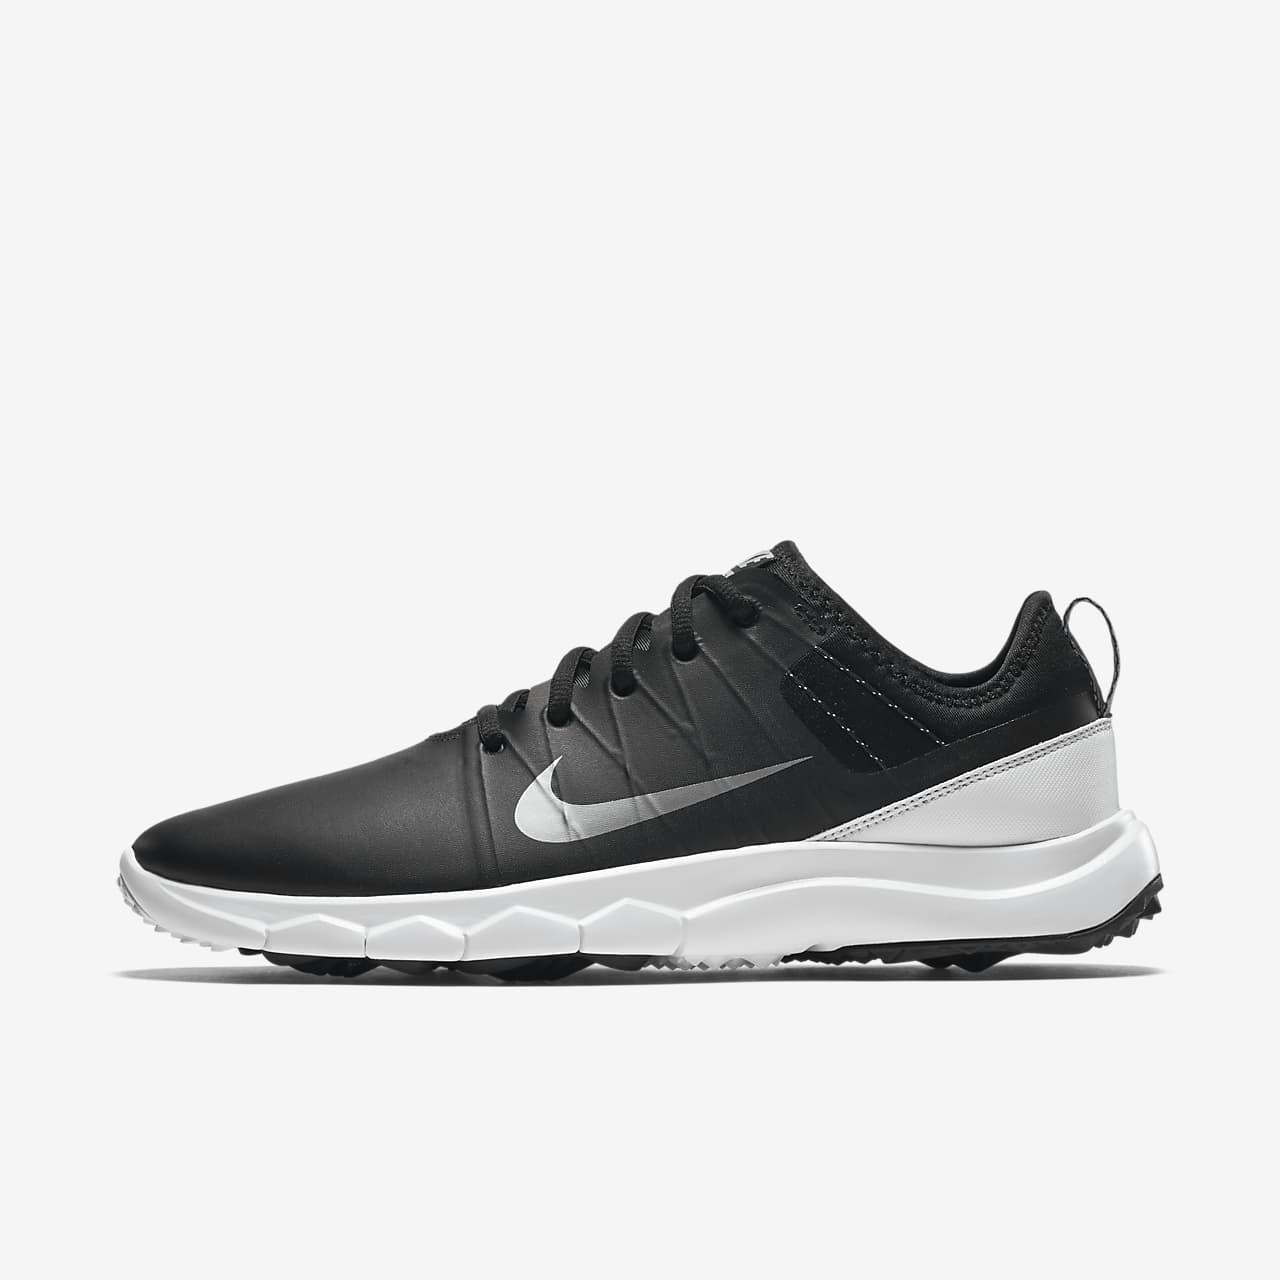 Calzado de golf para mujer Nike FI Impact 2